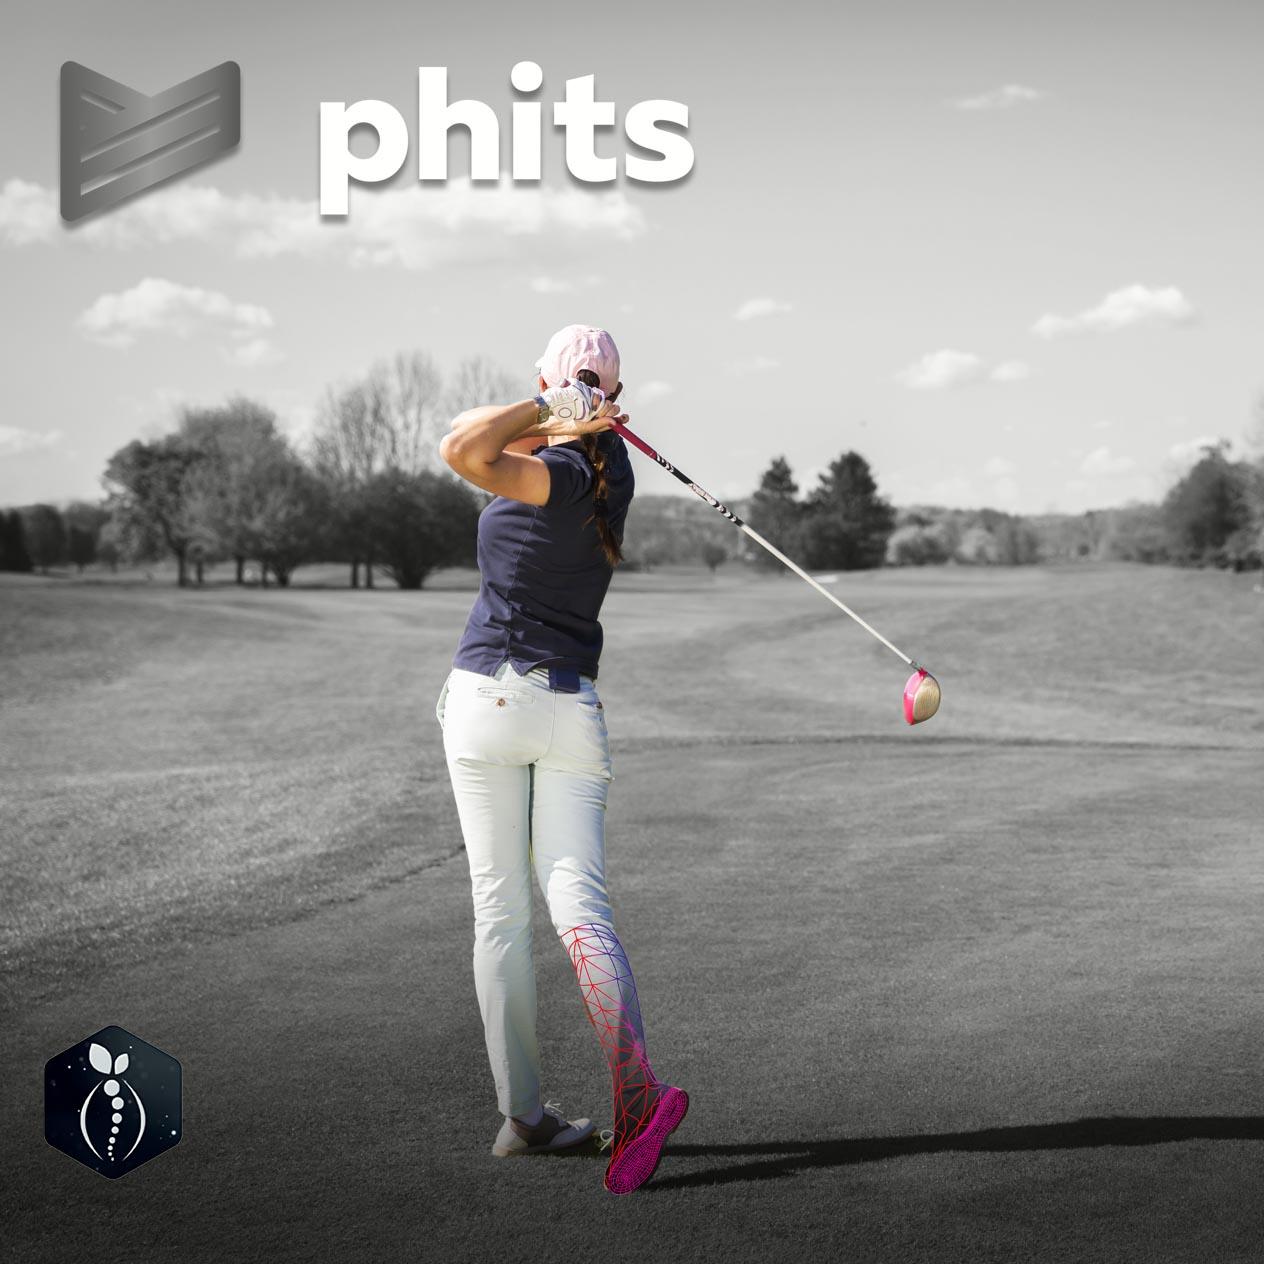 Custom Orthotics for Golf